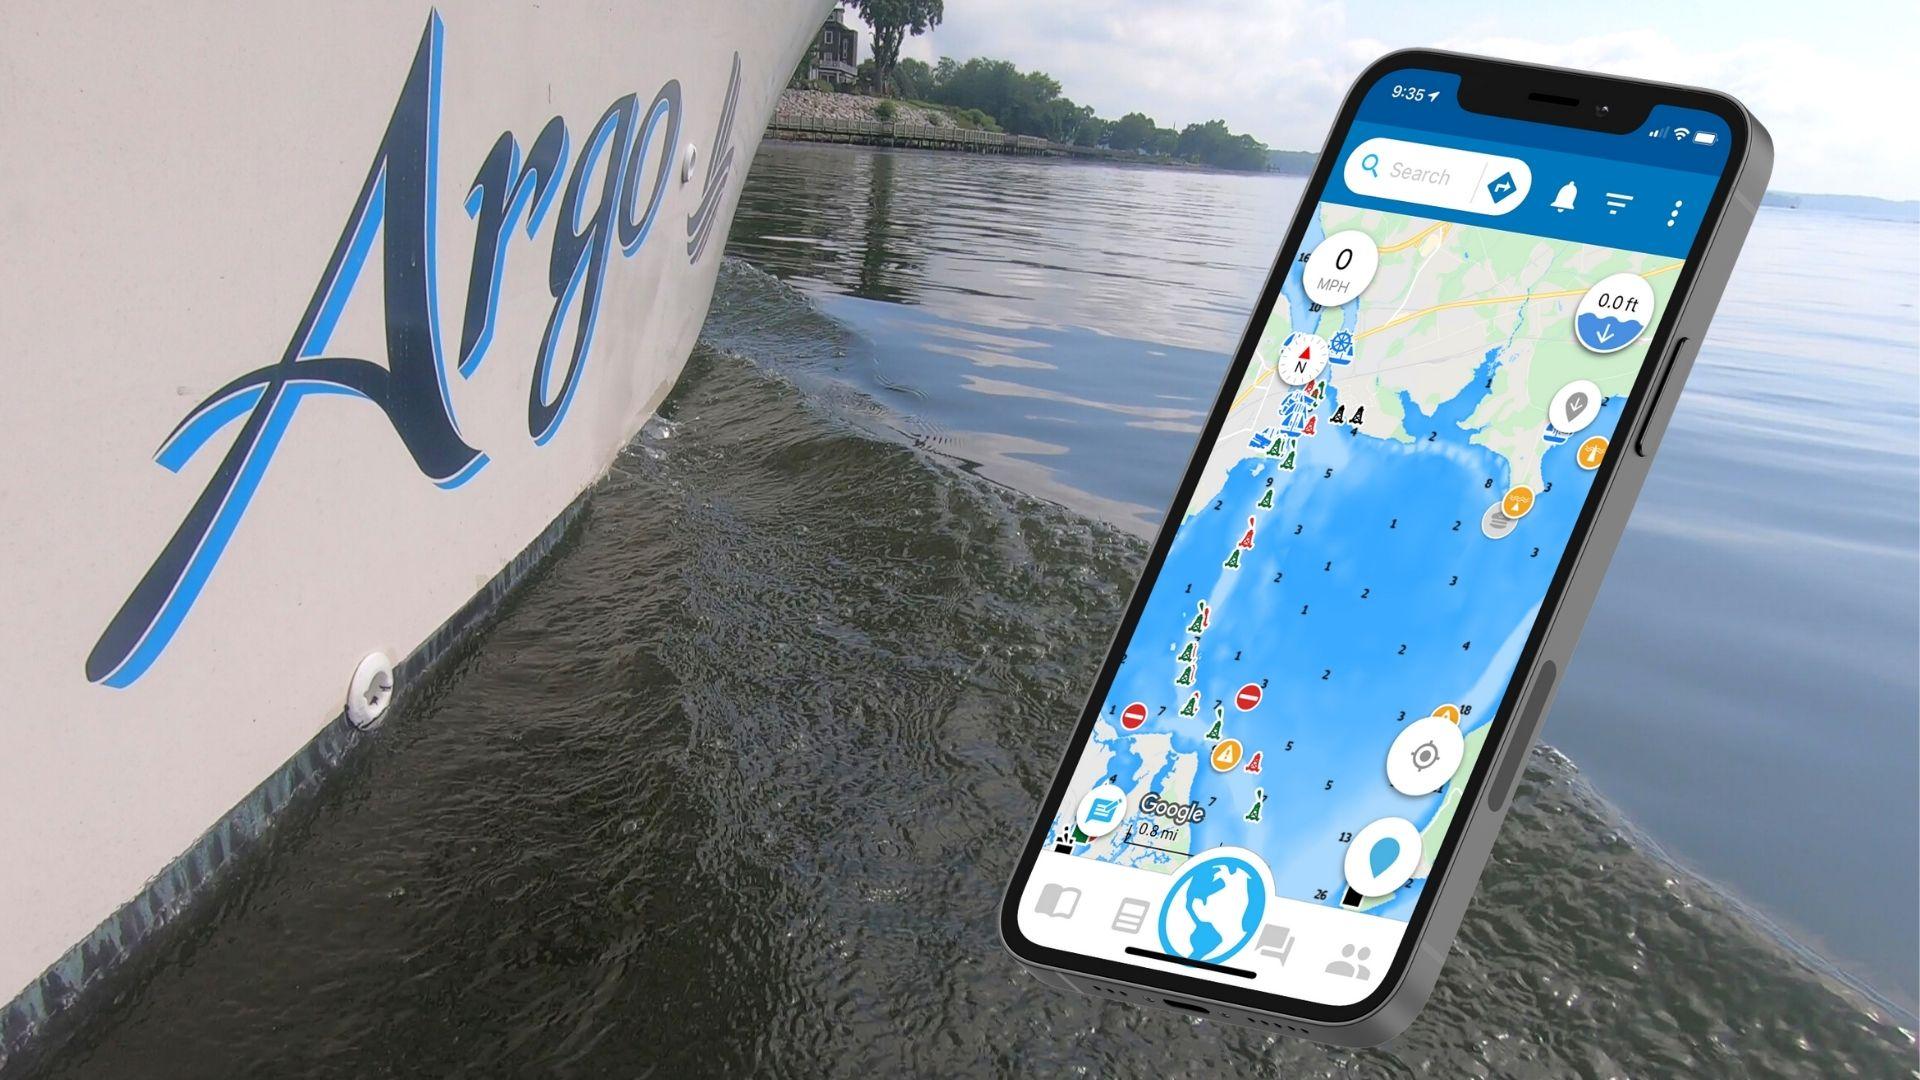 Argo boating depth layer